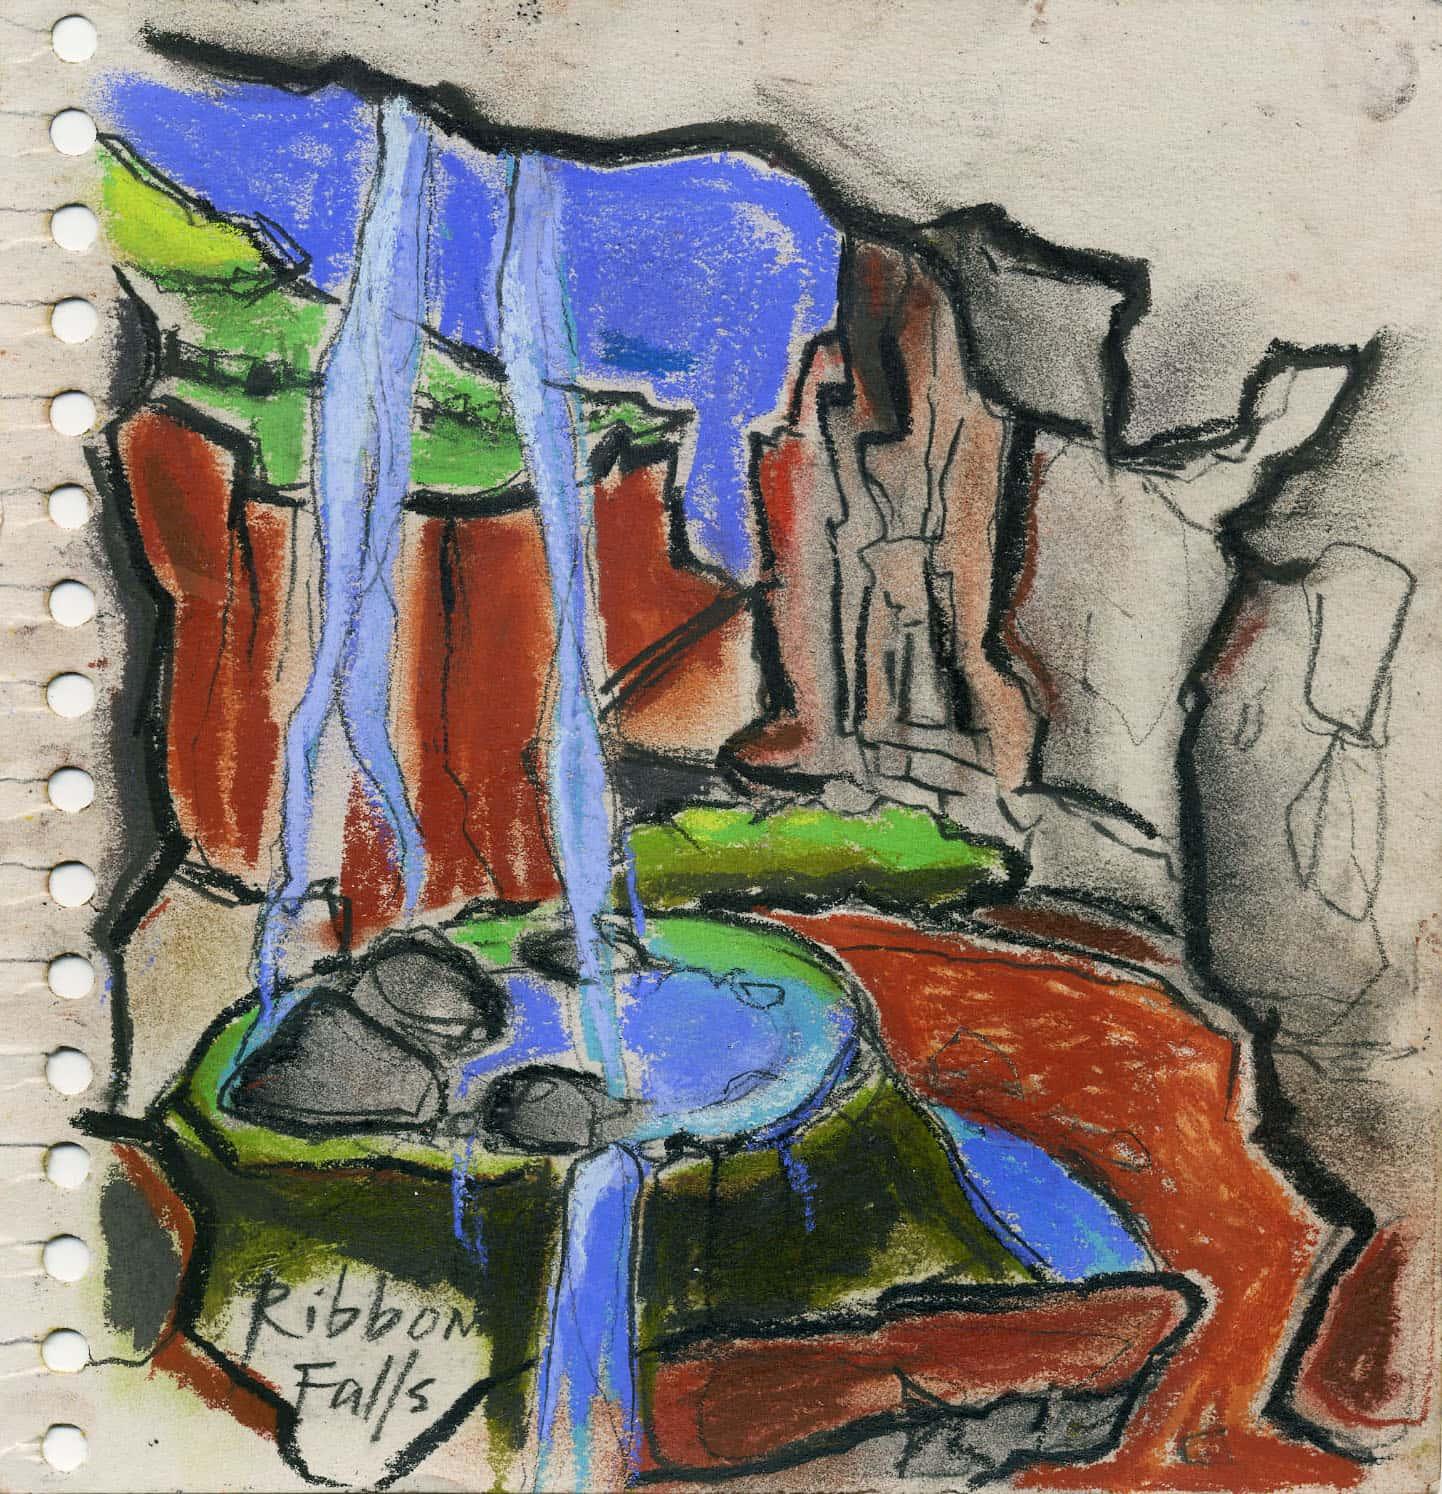 GC-Ribbon Falls-min.jpg